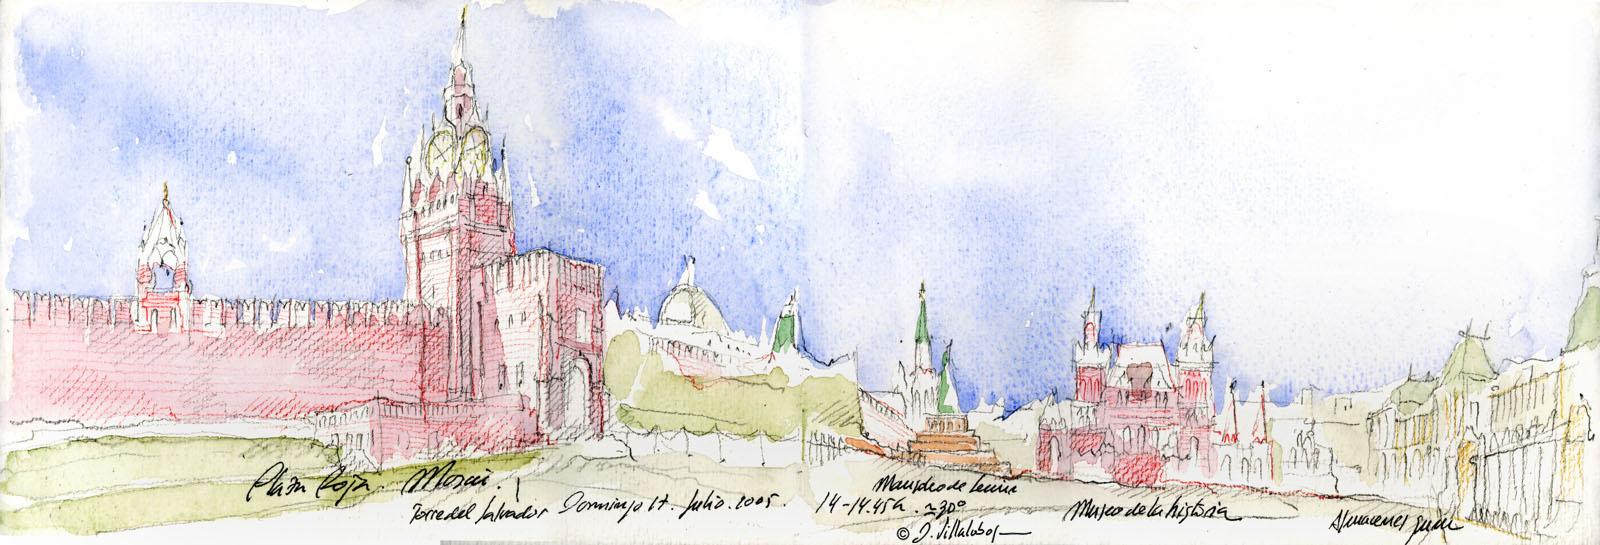 danielvillalobos-architecture-sketchbook-sketch-russia-6